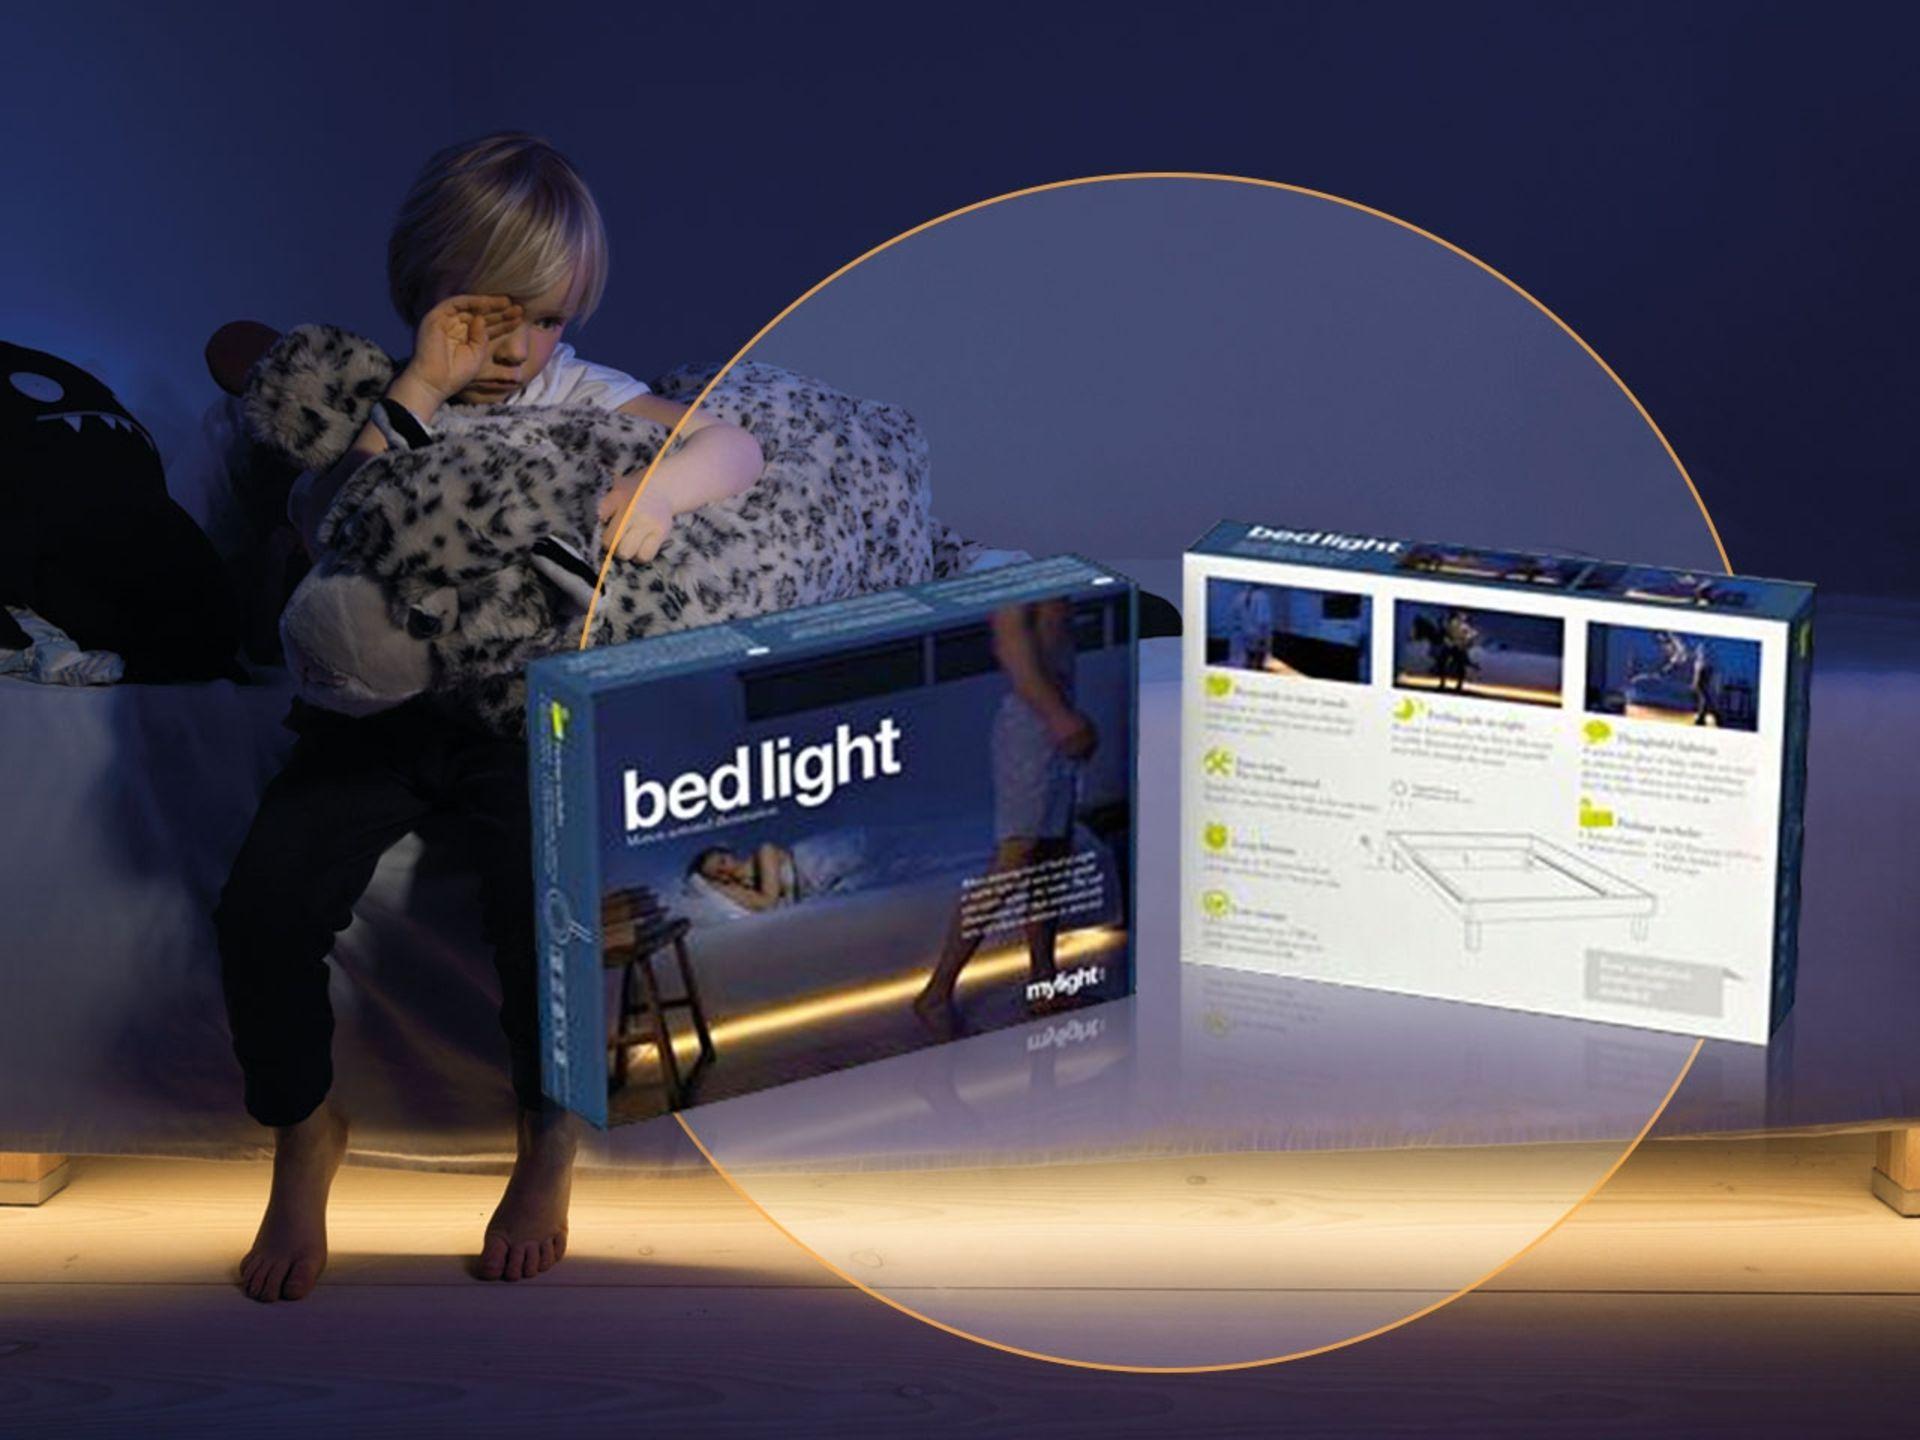 Lot 50026 - V Brand New Motion Activated Bedlight - Amazon Price £67.22 - Multi Purpose - Max. 12W -